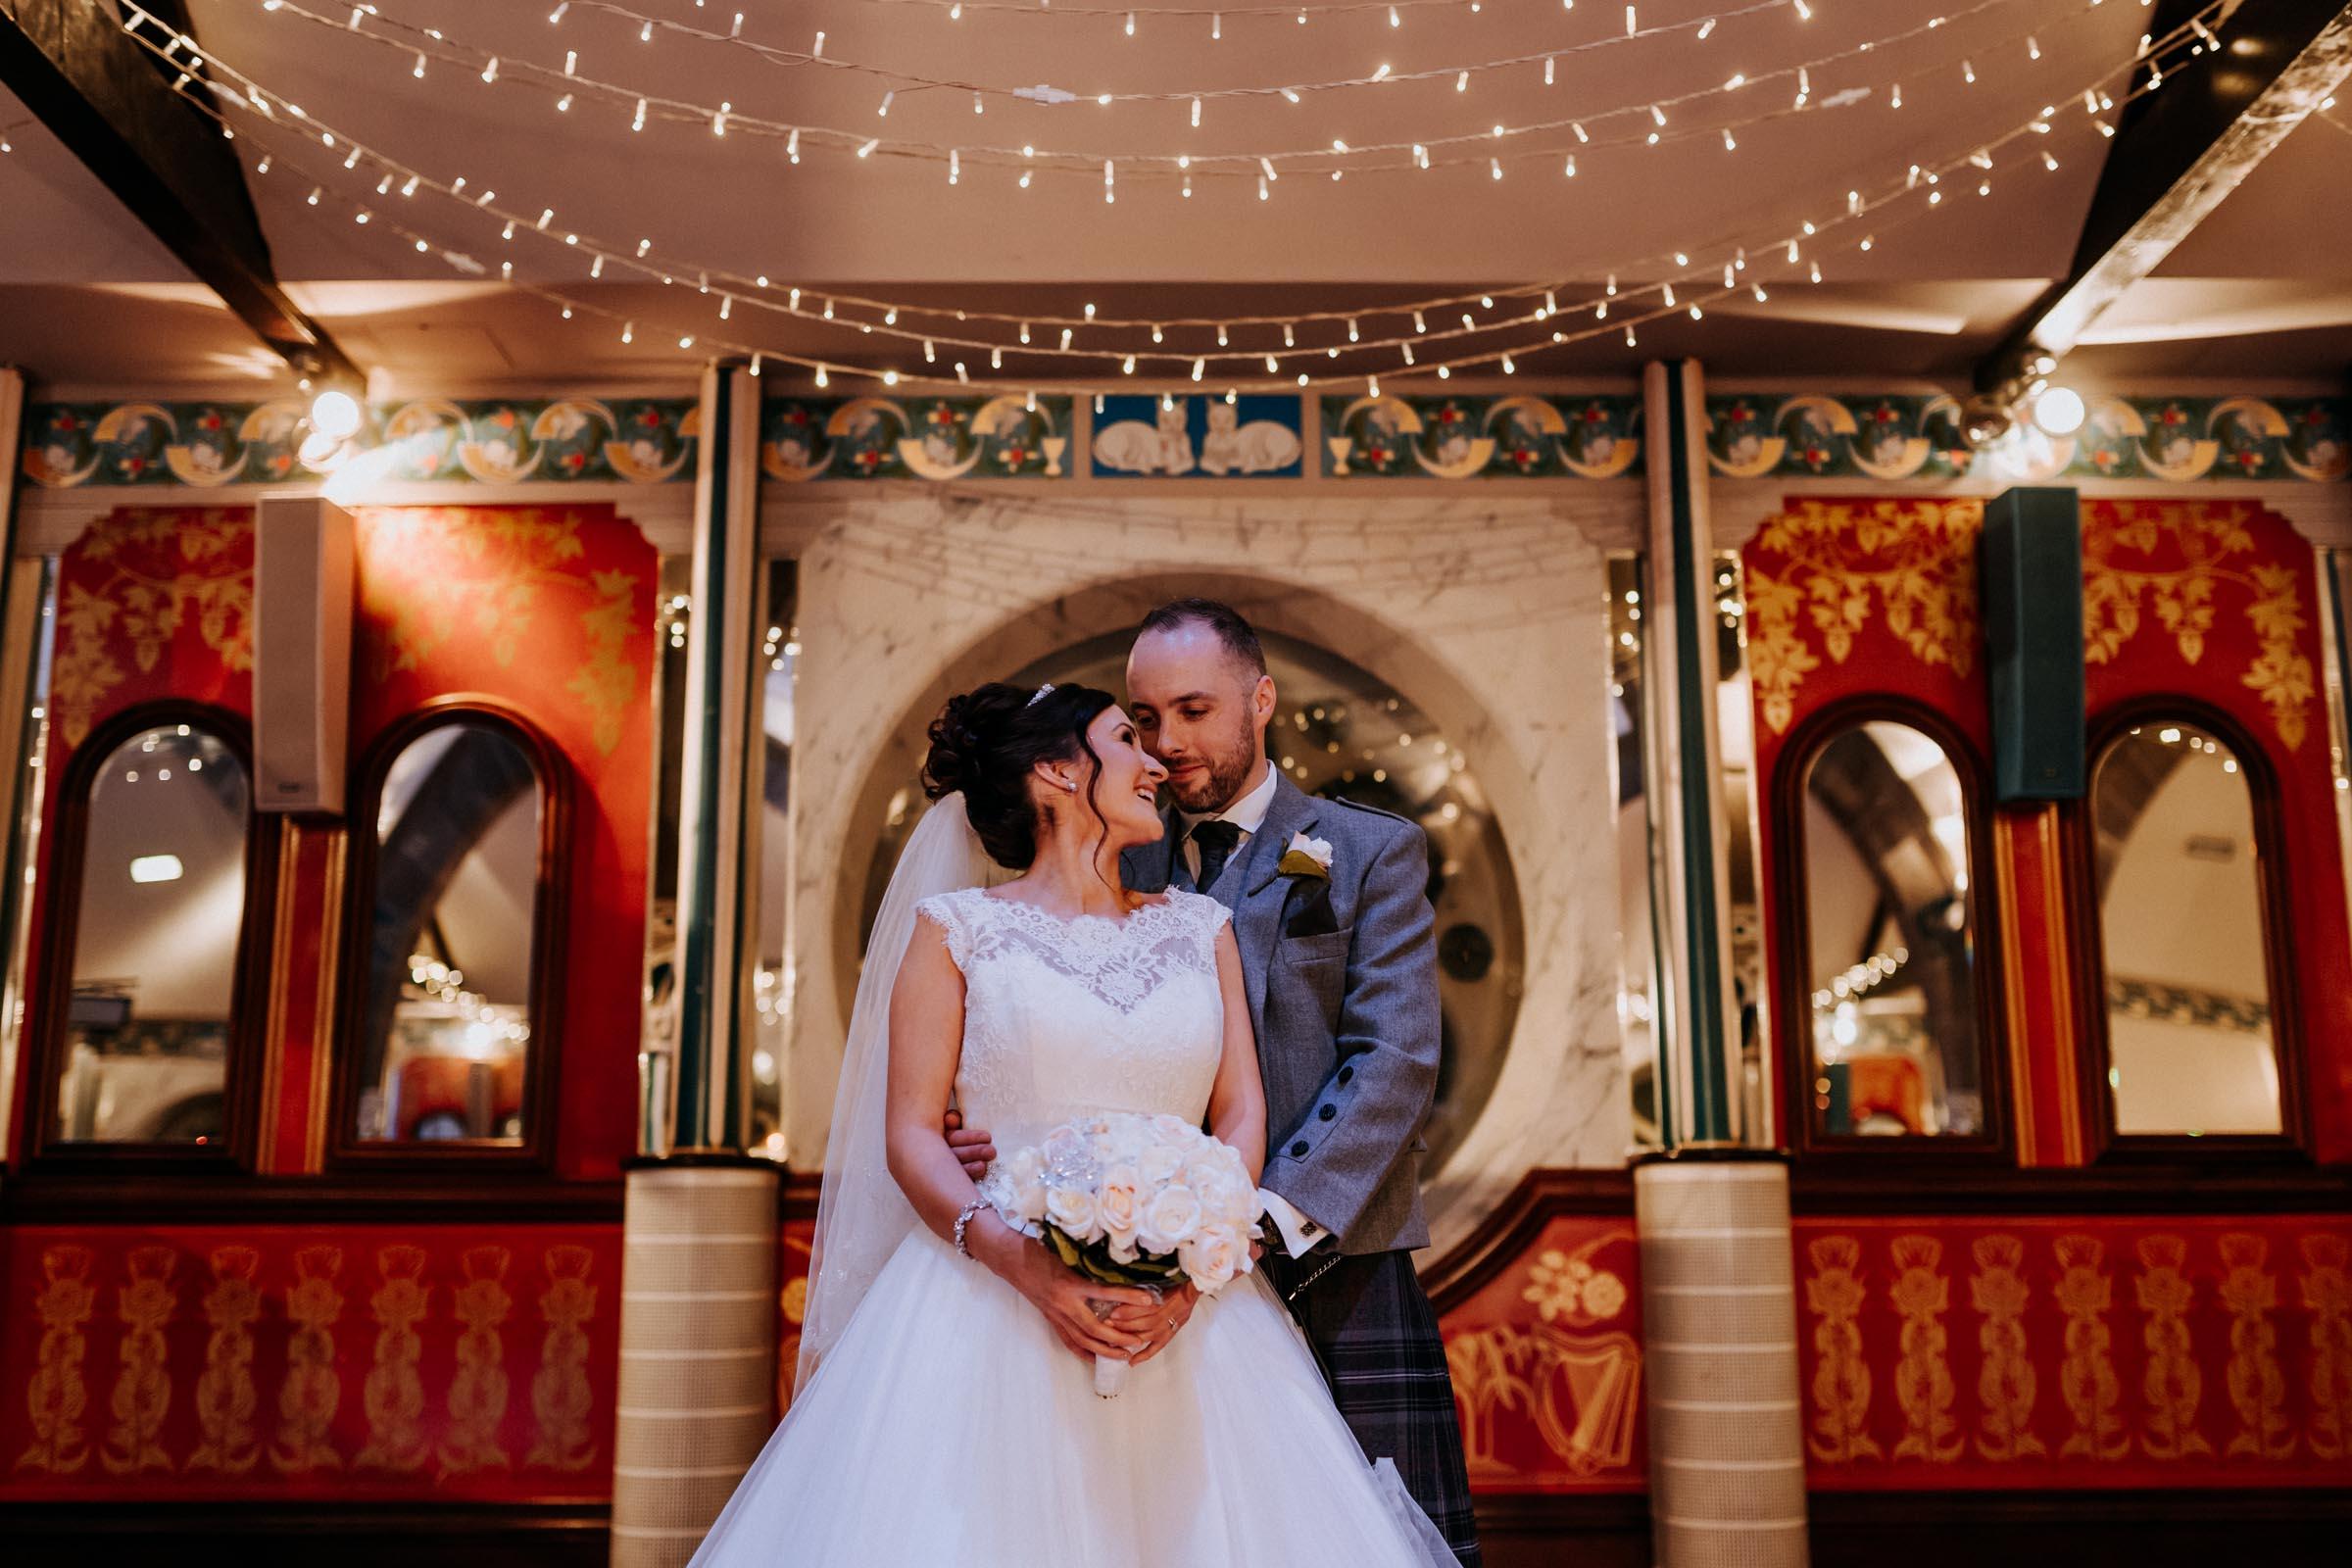 Oran-Mor-Wedding-Photographer-DearlyPhotography (27 of 55).jpg